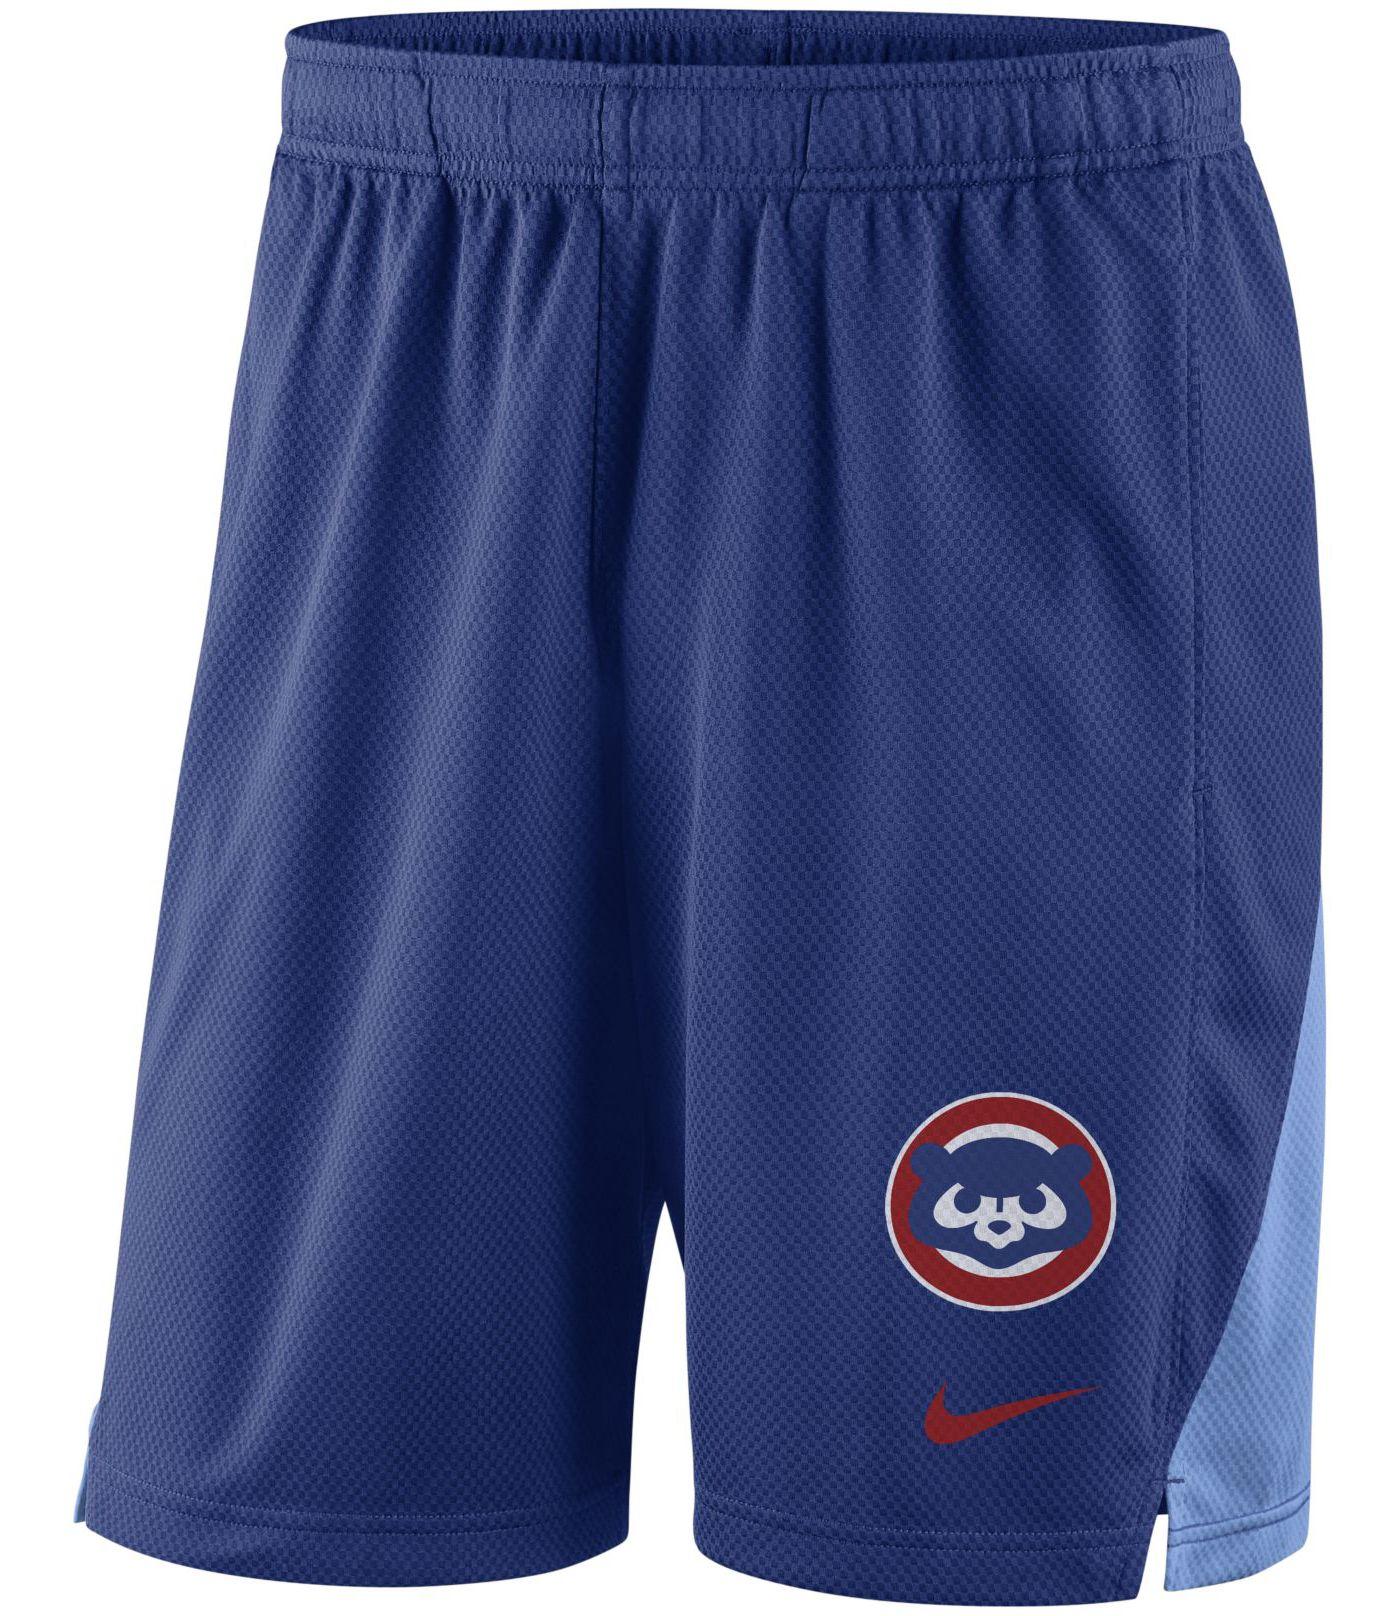 Nike Men's Chicago Cubs Franchise Knit Shorts